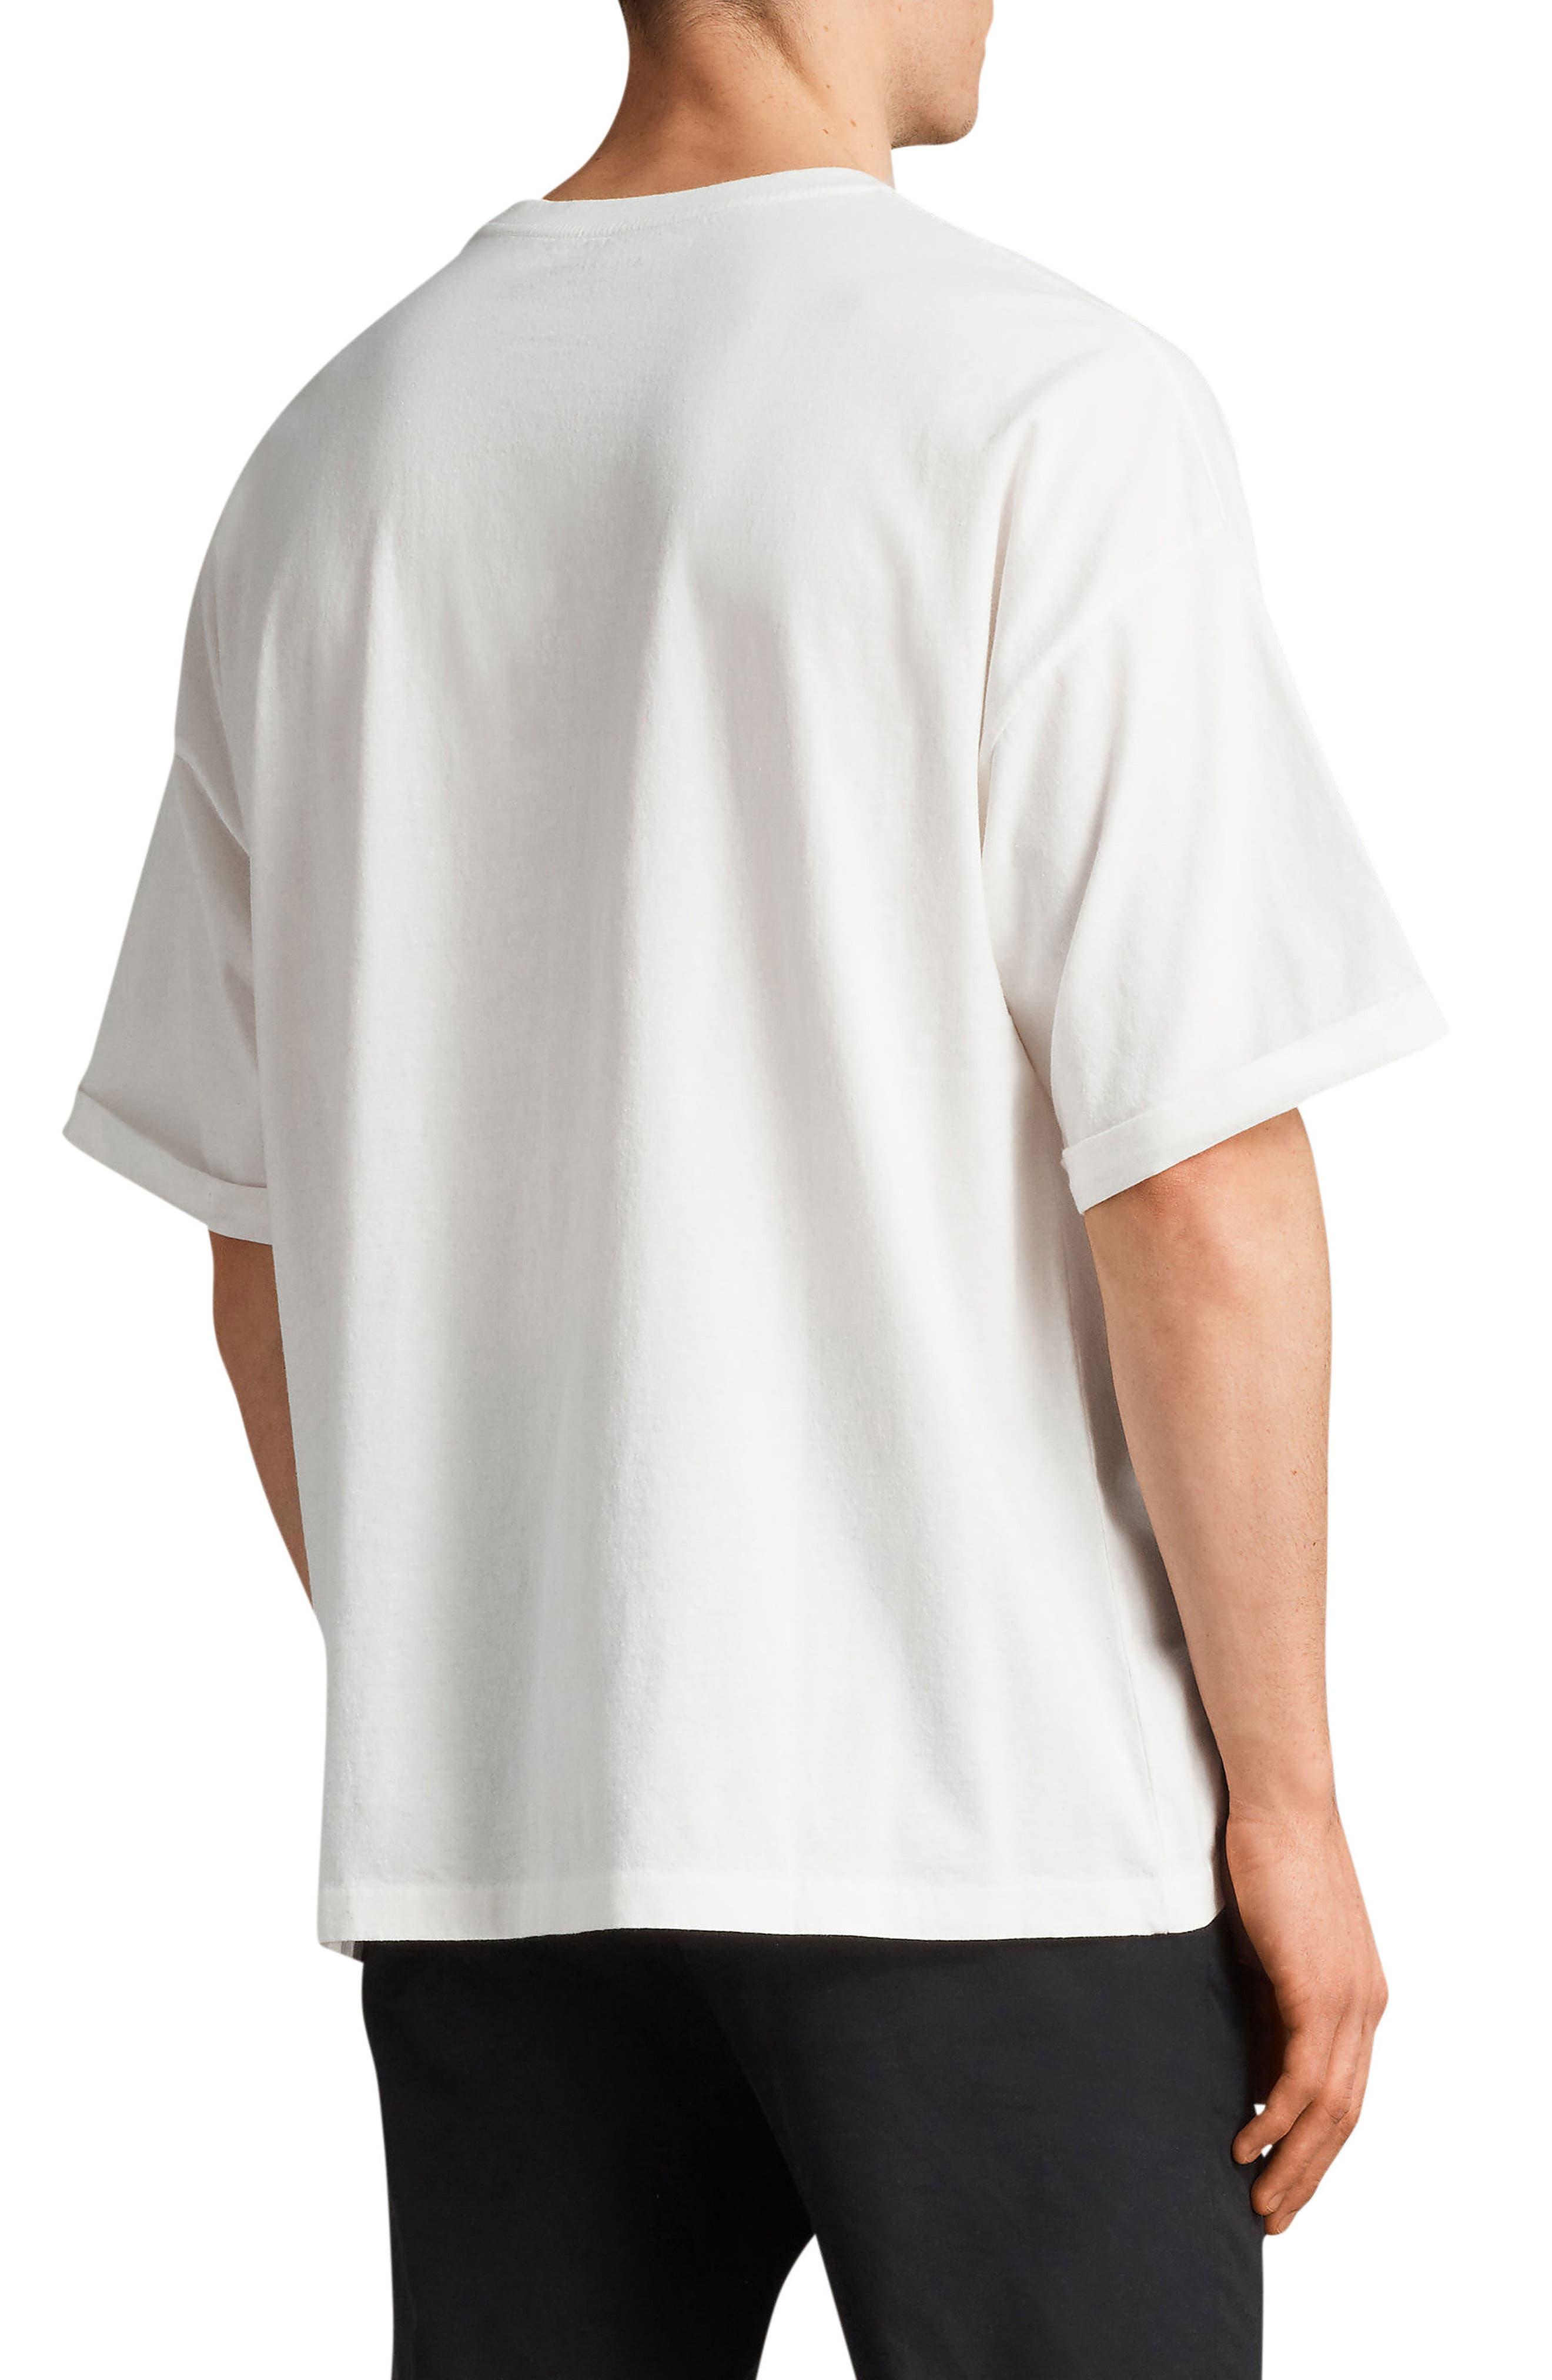 Kleeve Oversized Crewneck T-Shirt,                             Alternate thumbnail 2, color,                             Chalk Marl